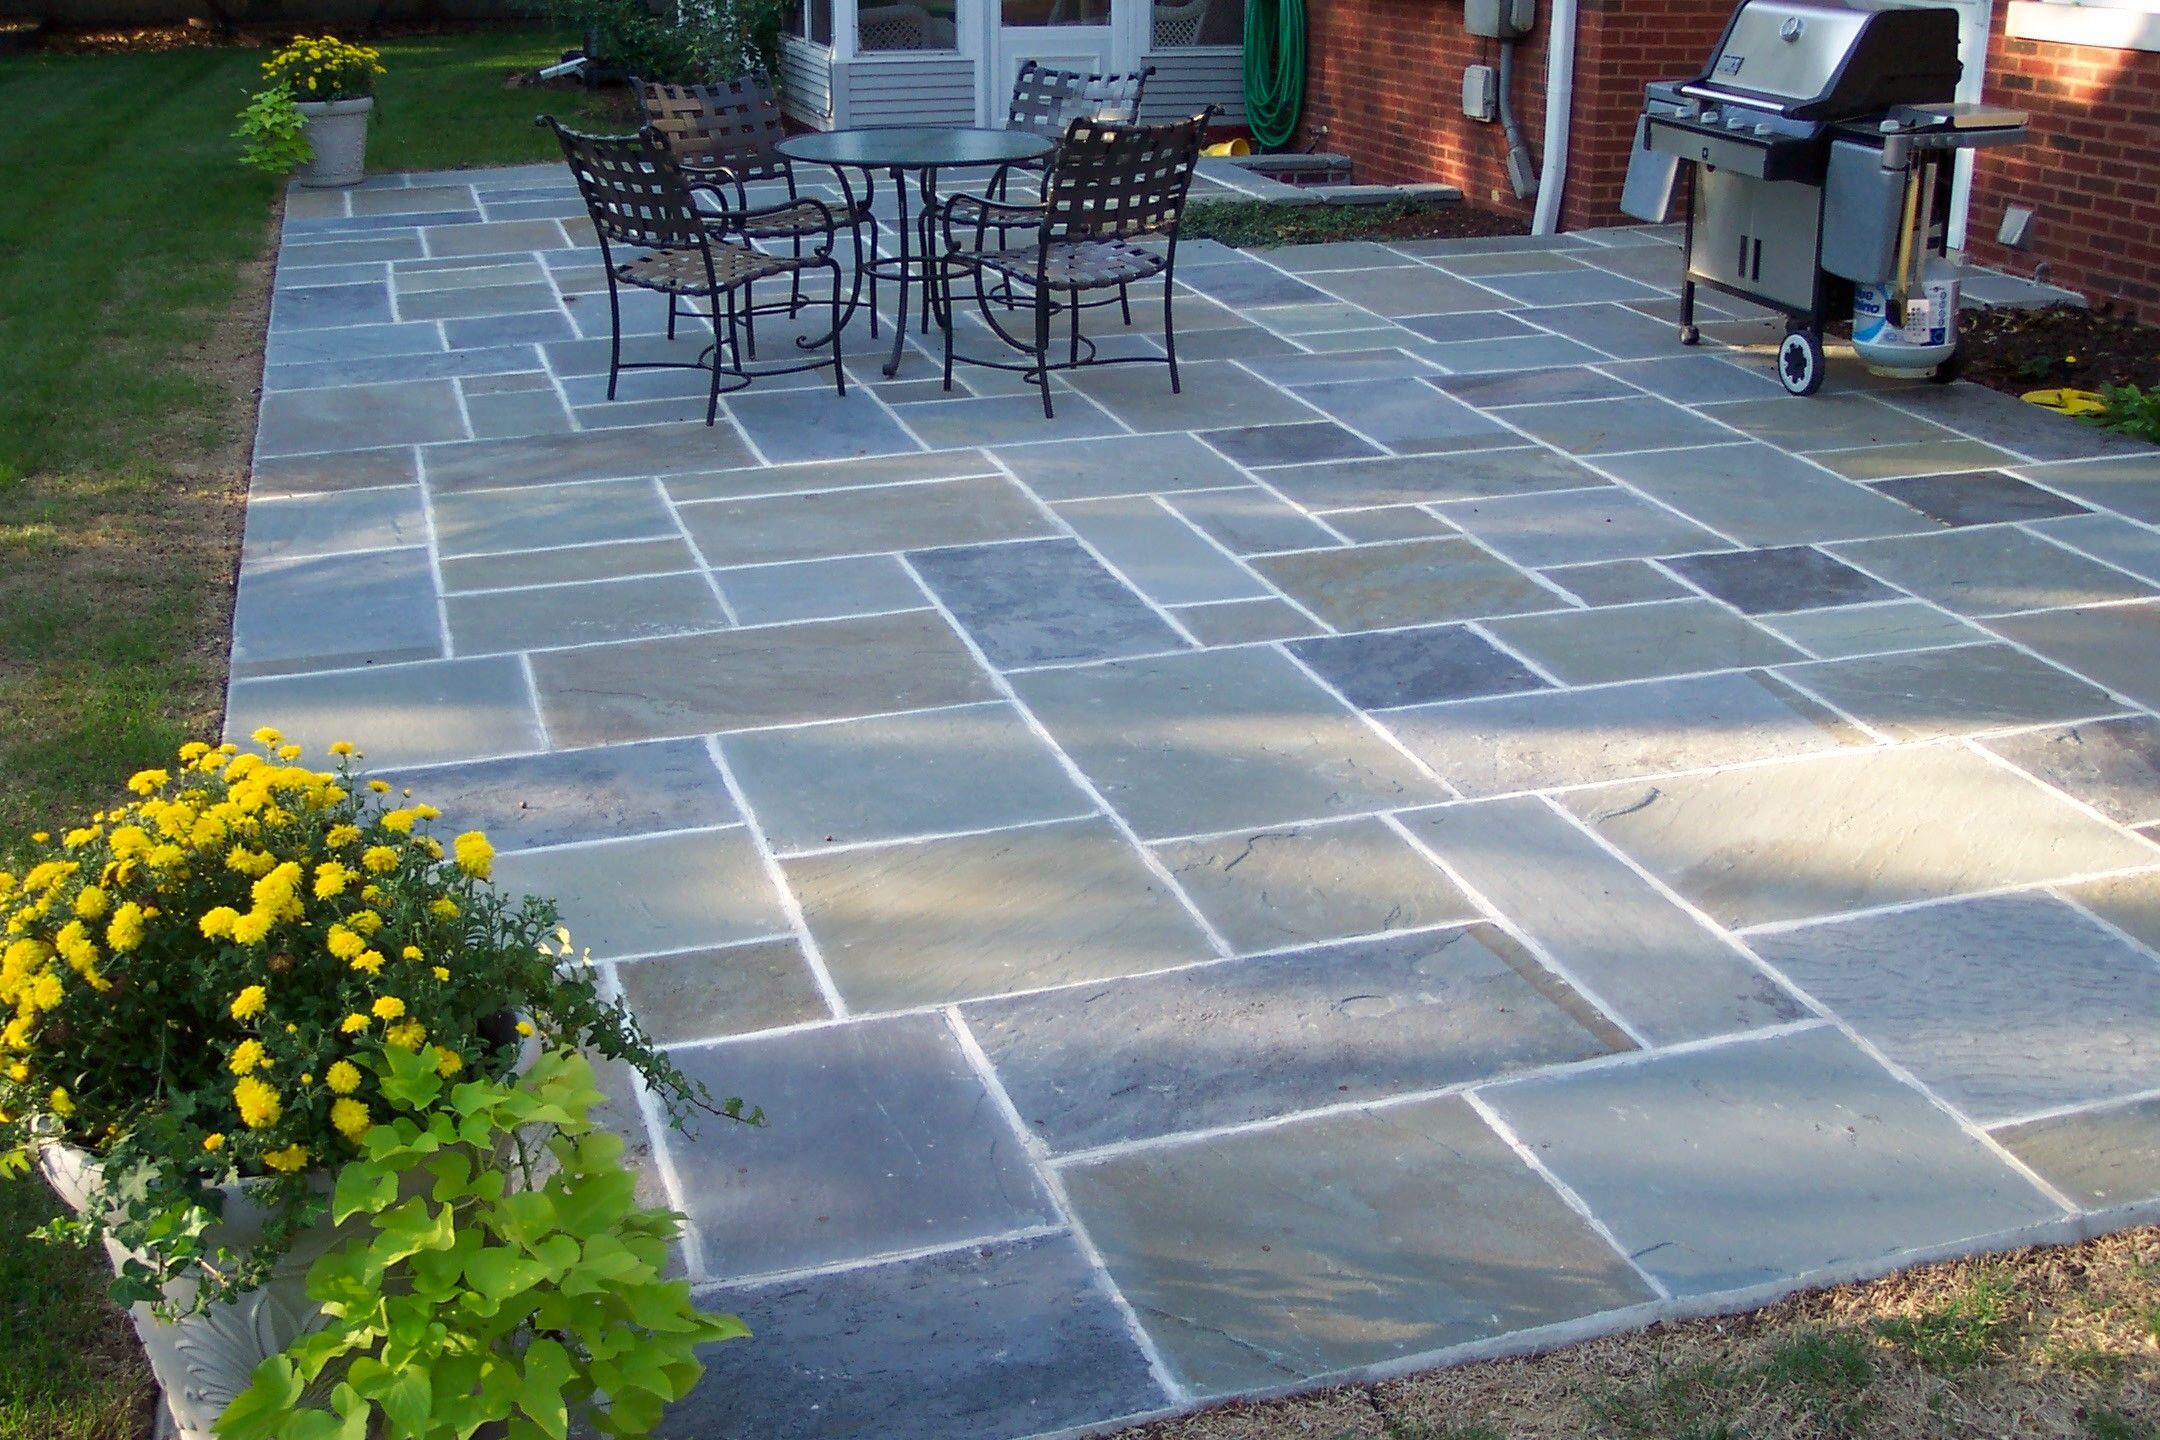 bluestone patio design ideas Bluestone Patio Design - Stone patio designs   Front porch